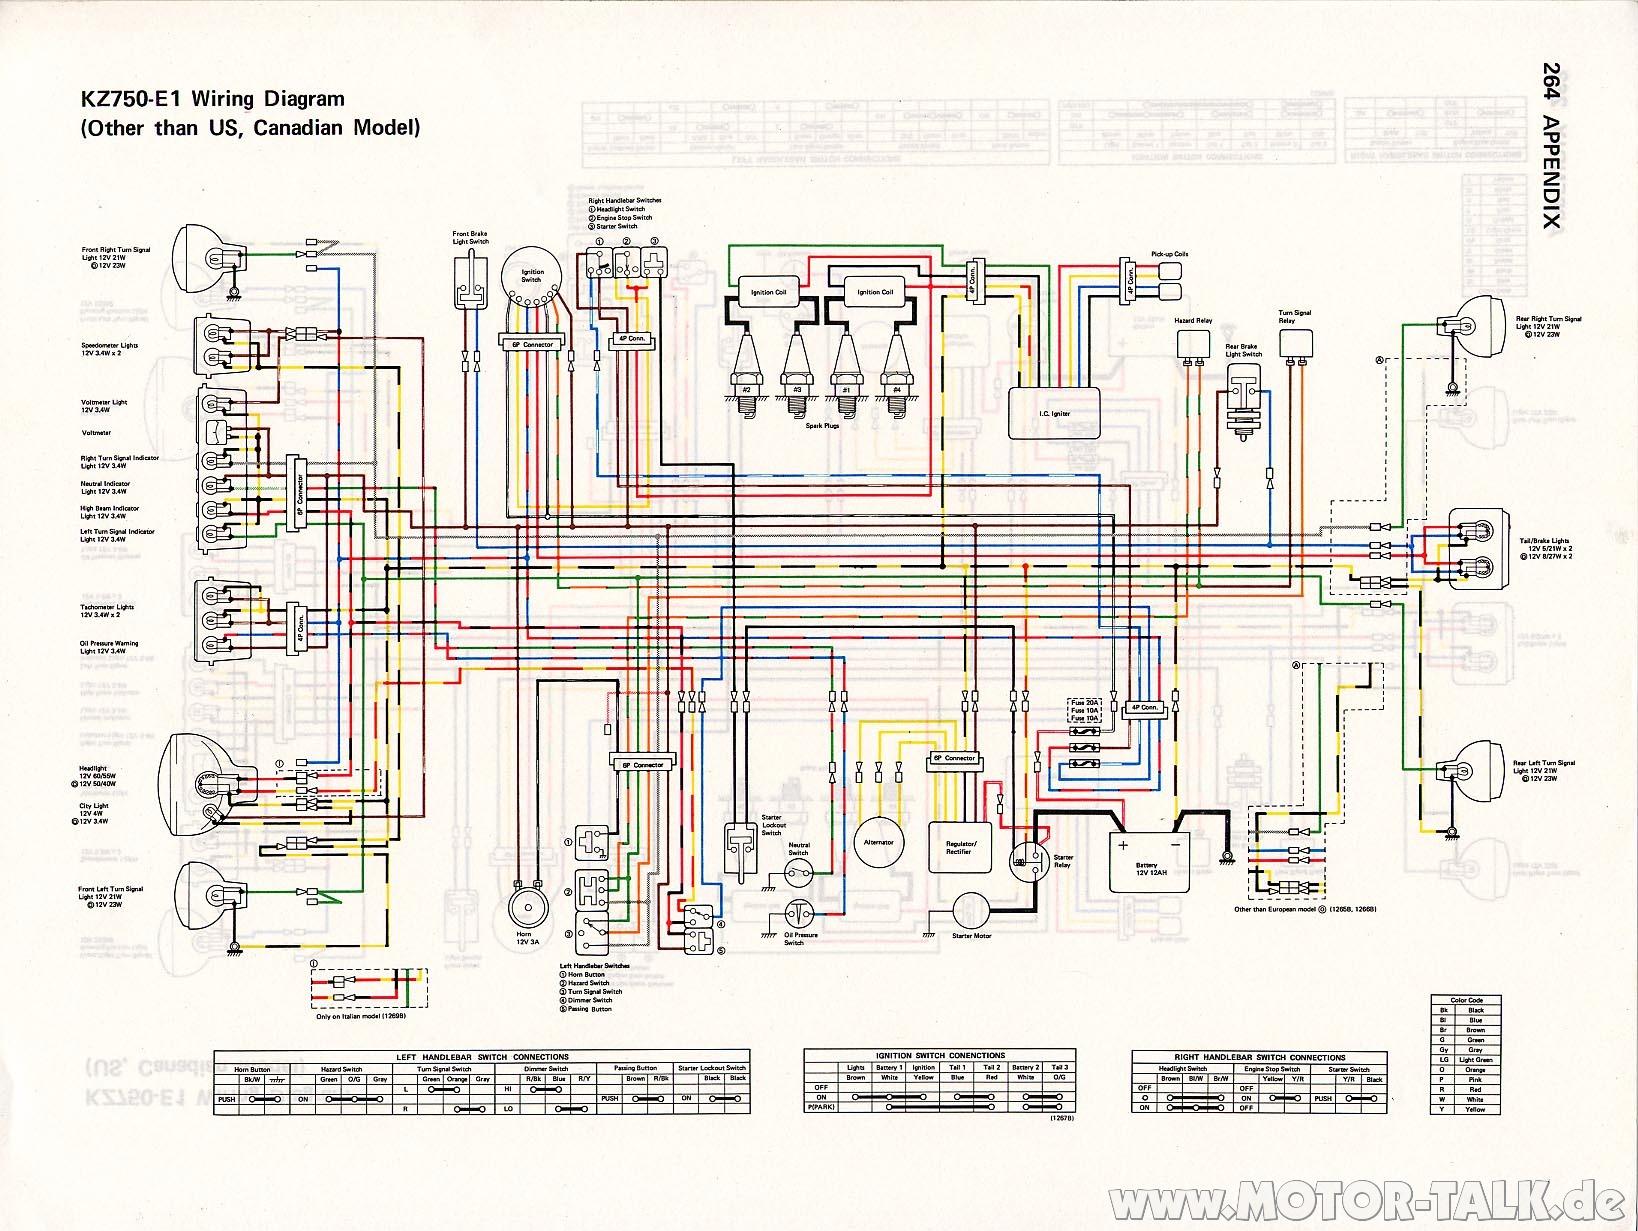 hight resolution of 1981 yamaha xj650 wiring diagram 1981 yamaha xj550 wiring 1978 yamaha xs650 wiring